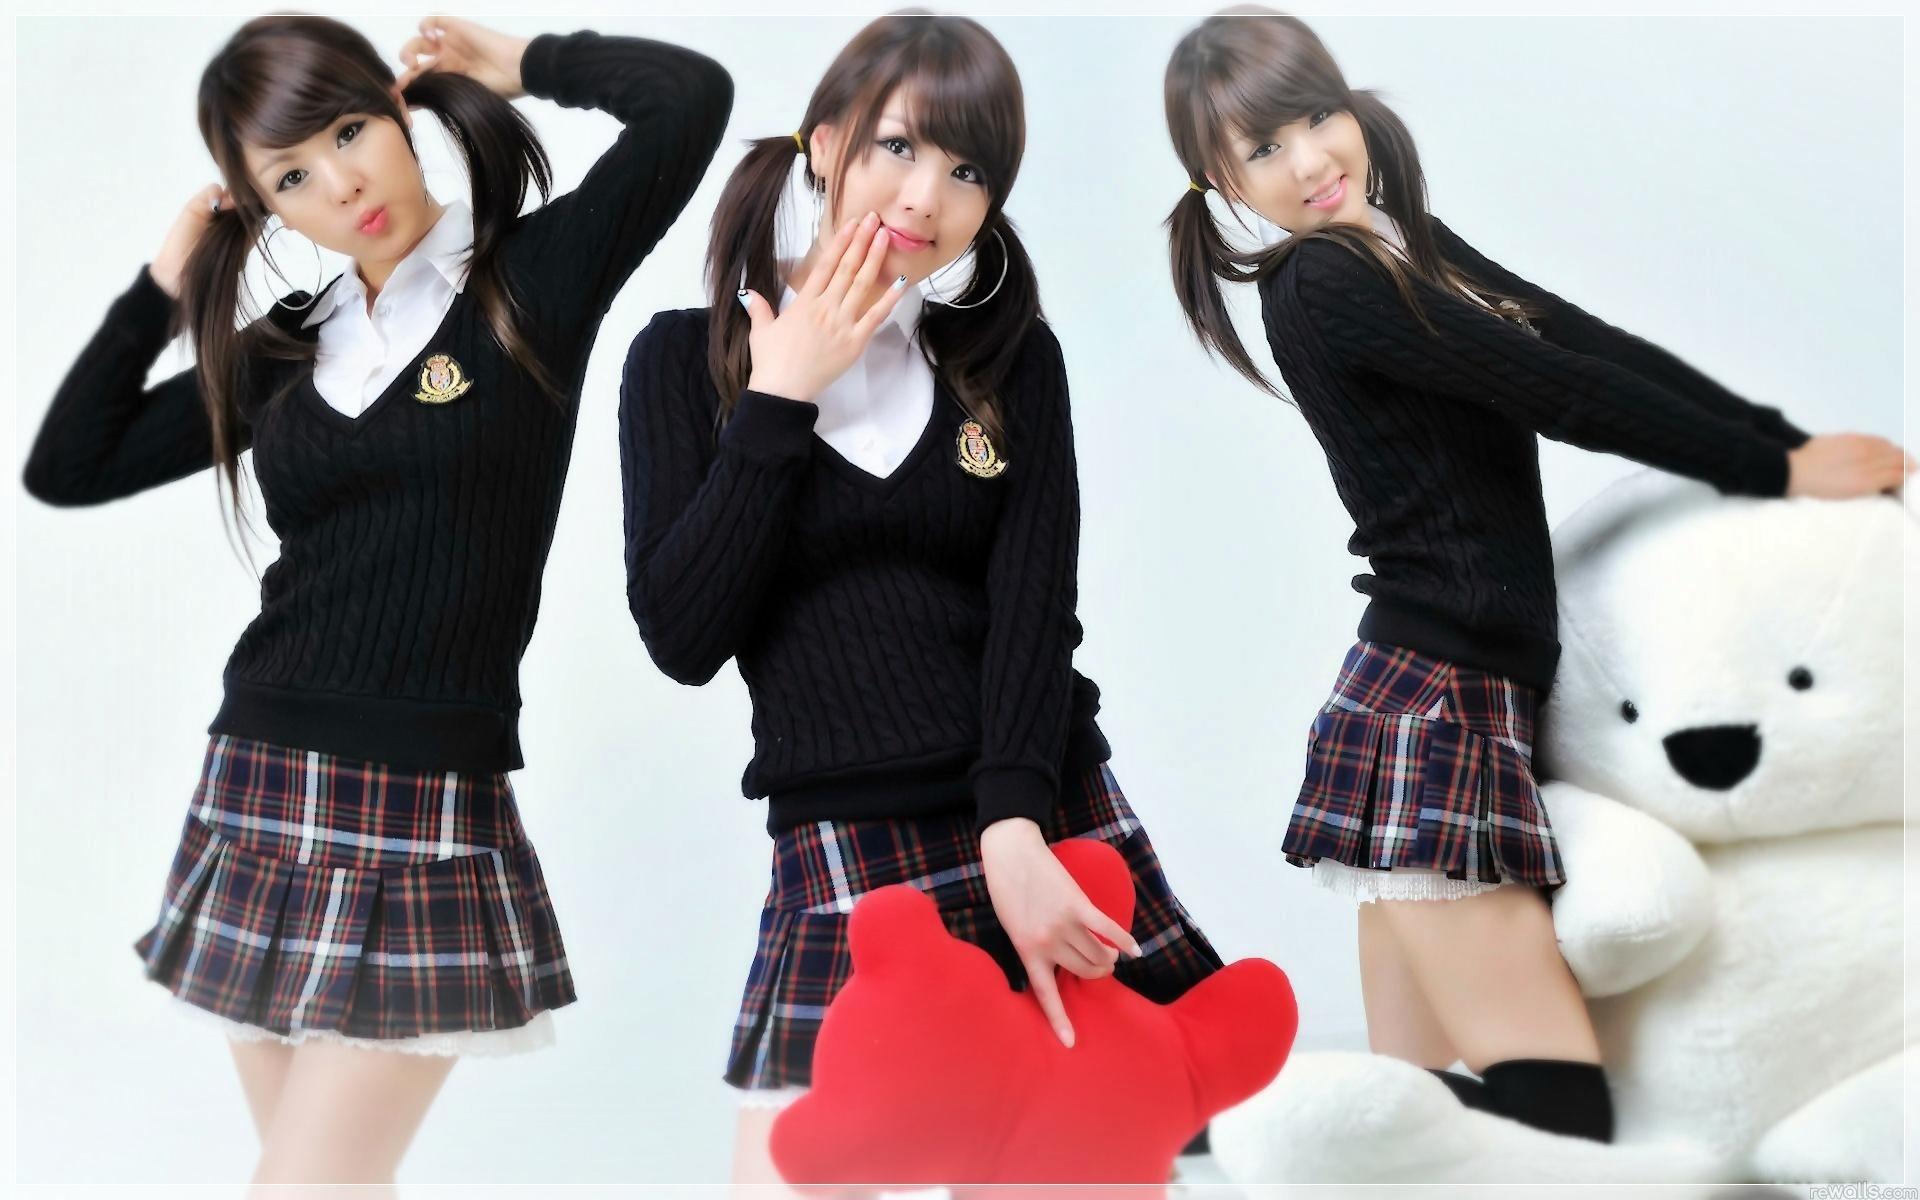 Японские девочки эротика фото 17 фотография